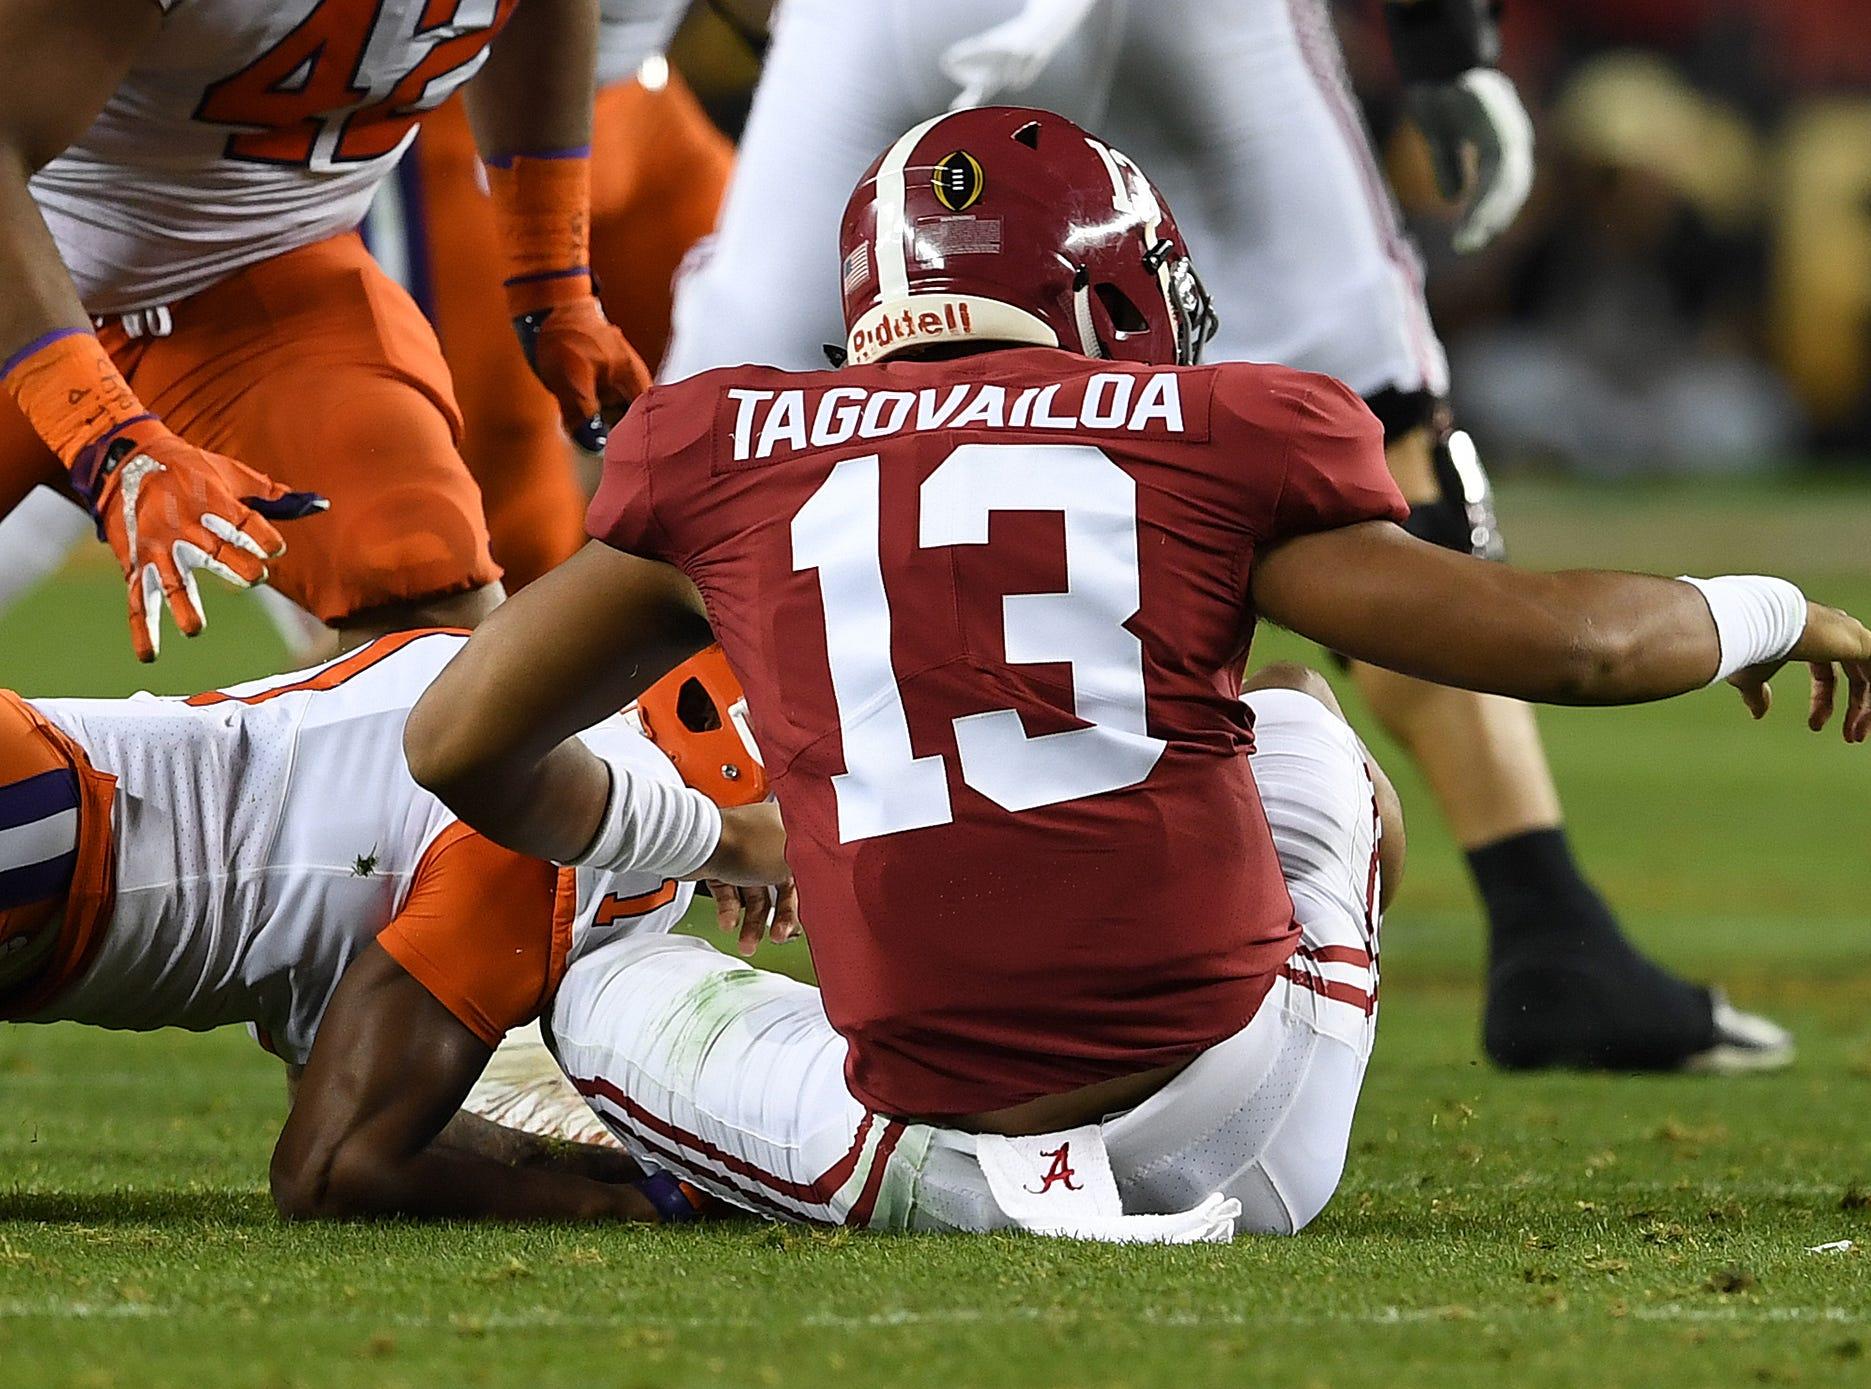 Clemson cornerback Trayvon Mullen (1)  forces a fumble by Alabama quarterback Tua Tagovailoa (13) during the 2nd quarter of the College Football National Championship at Levi's Stadium in Santa Clara, CA Monday, January 7, 2019.